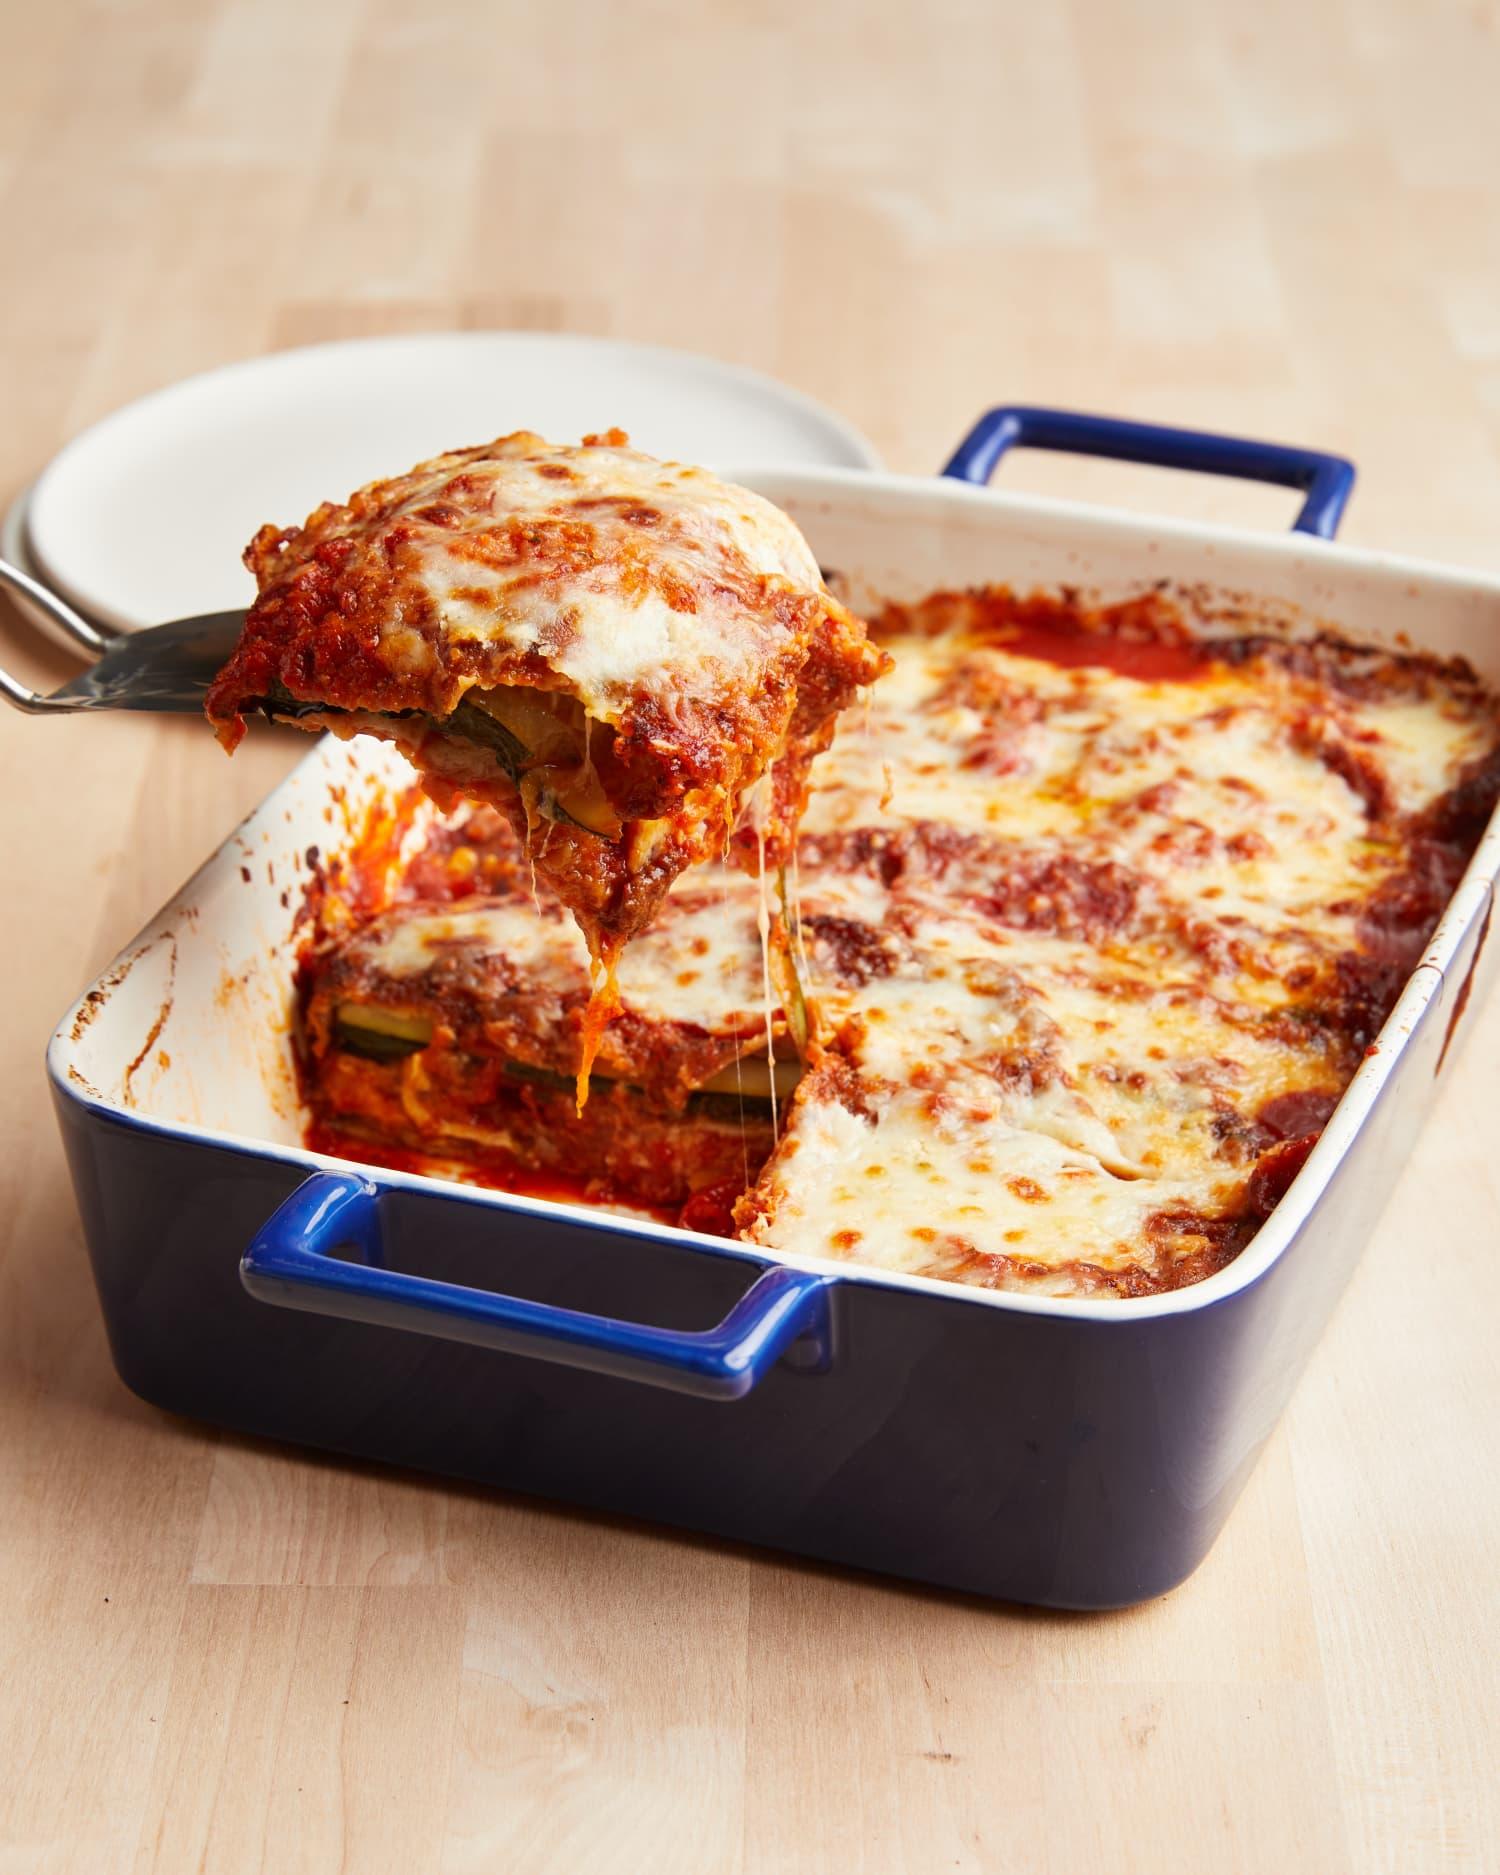 Zucchini Parmesan Is Summer's Greatest Comfort Food